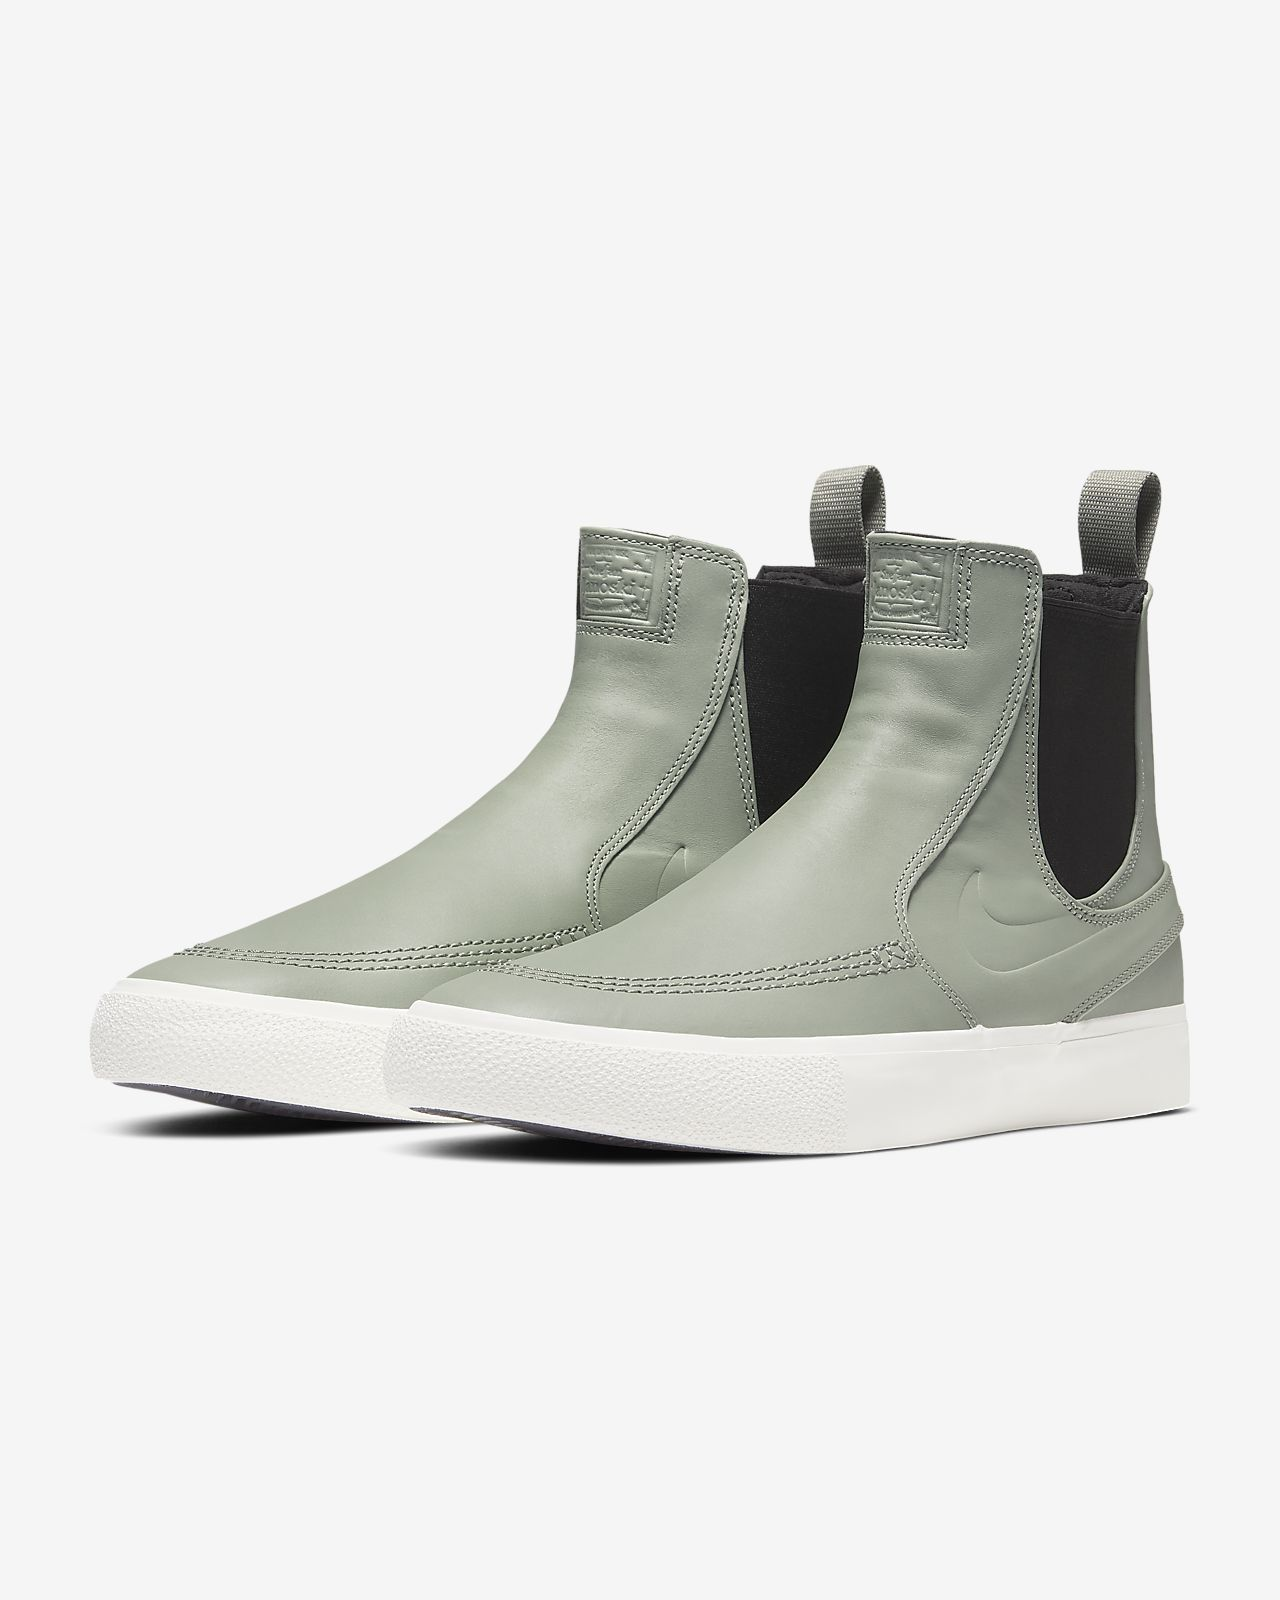 Nike SB Zoom Stefan Janoski Slip Mid RM Schuh (black pale ivory)